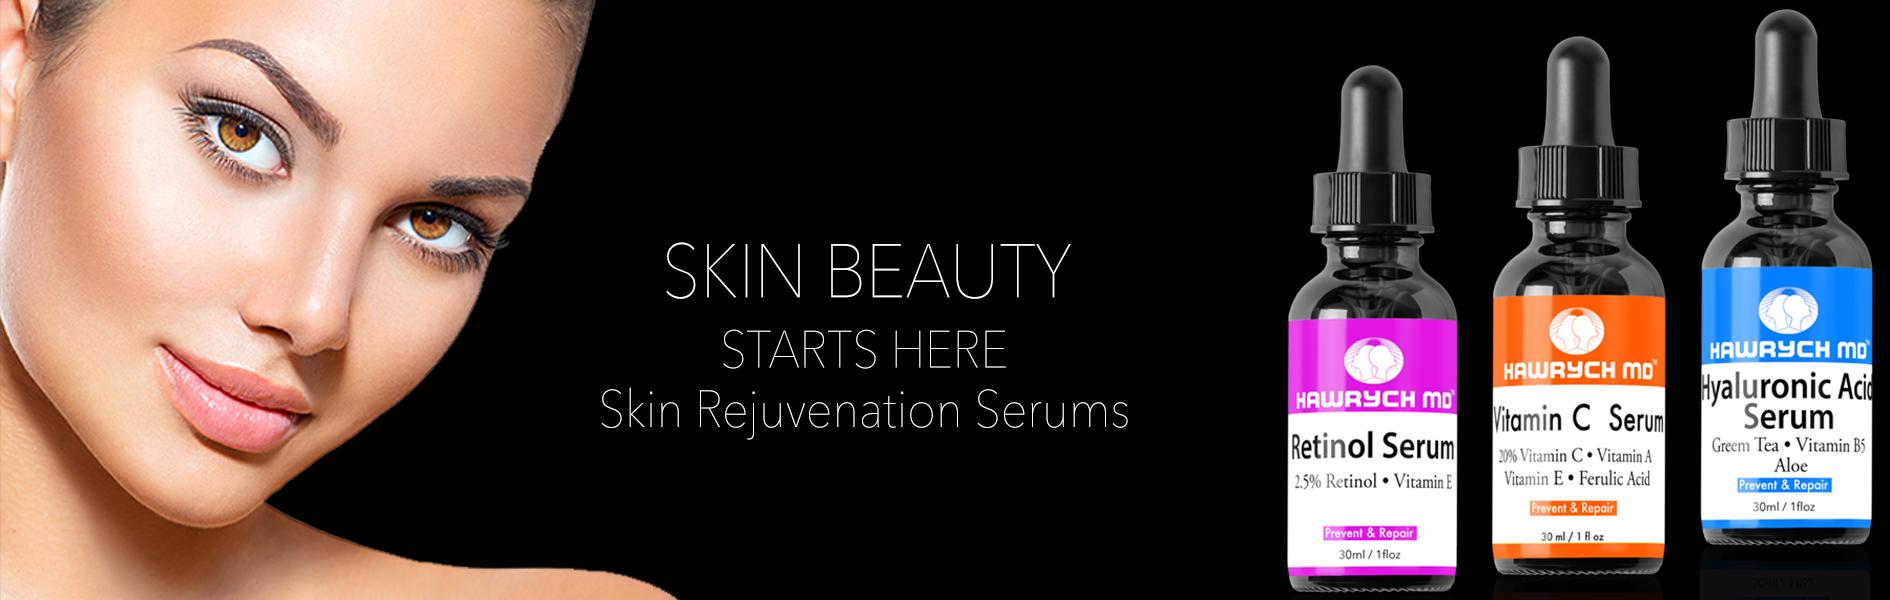 md skin serums vitamin c serum retrinol serum hyaluronic acid serum